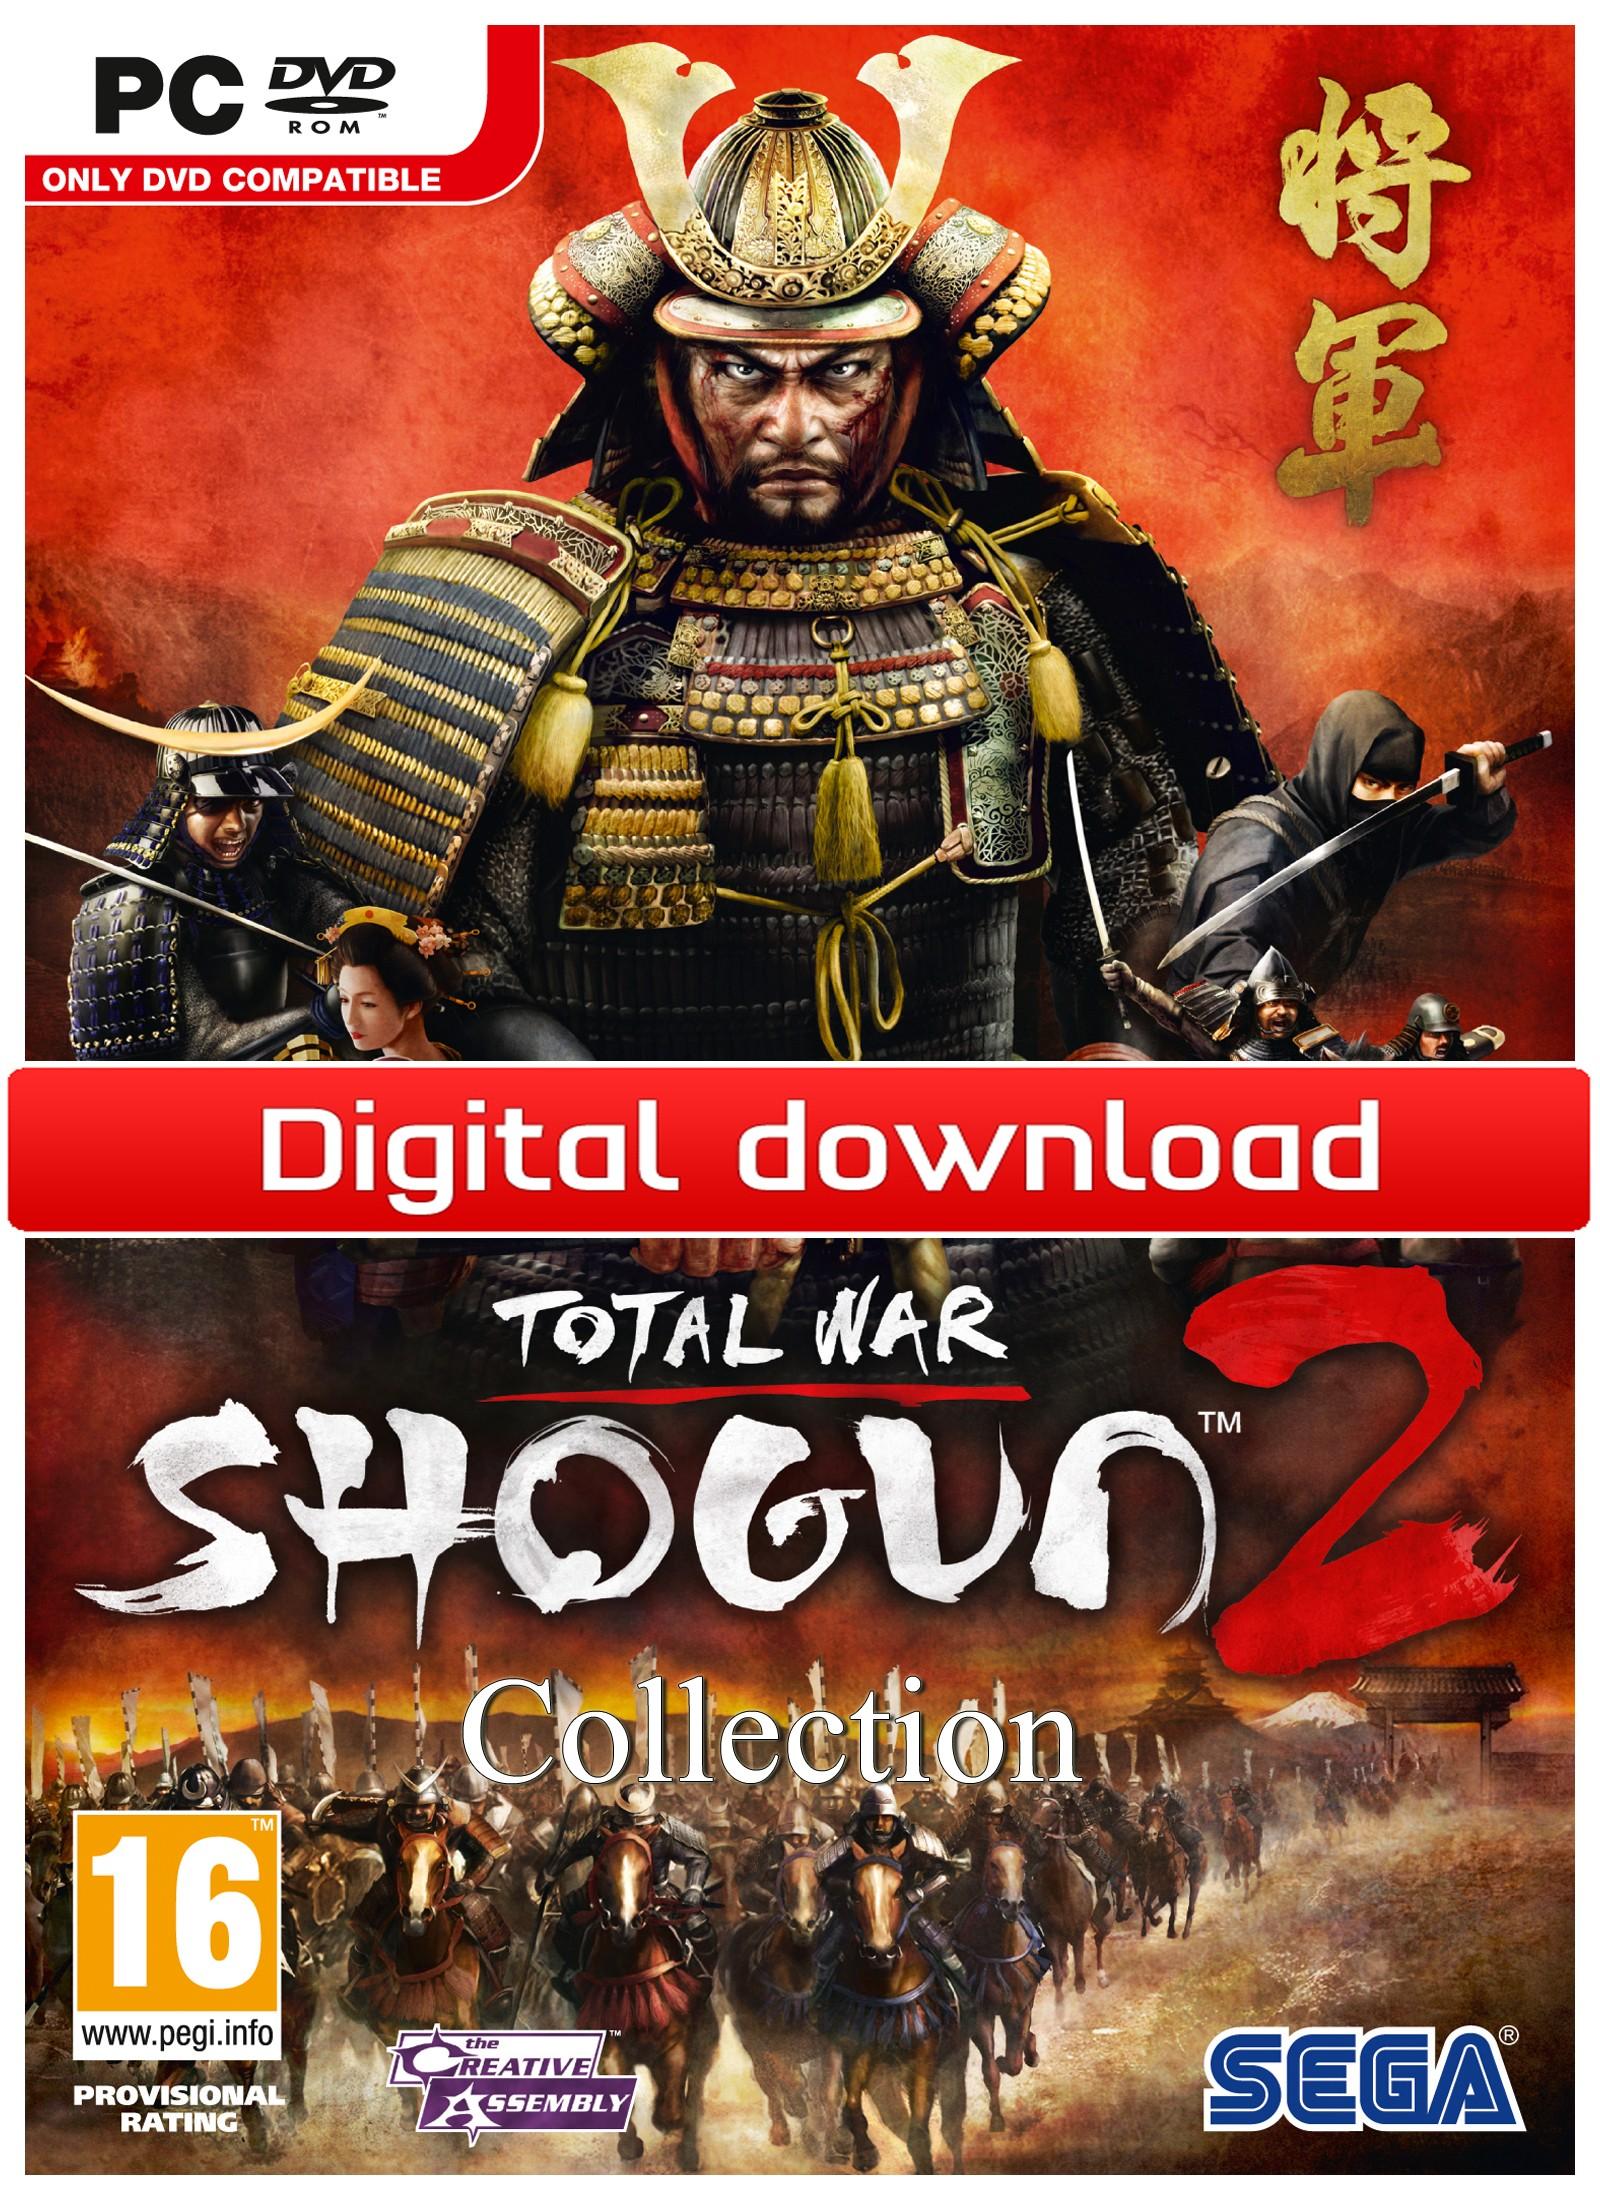 32792 : Total War: Shogun 2 Collection (PC nedlasting)